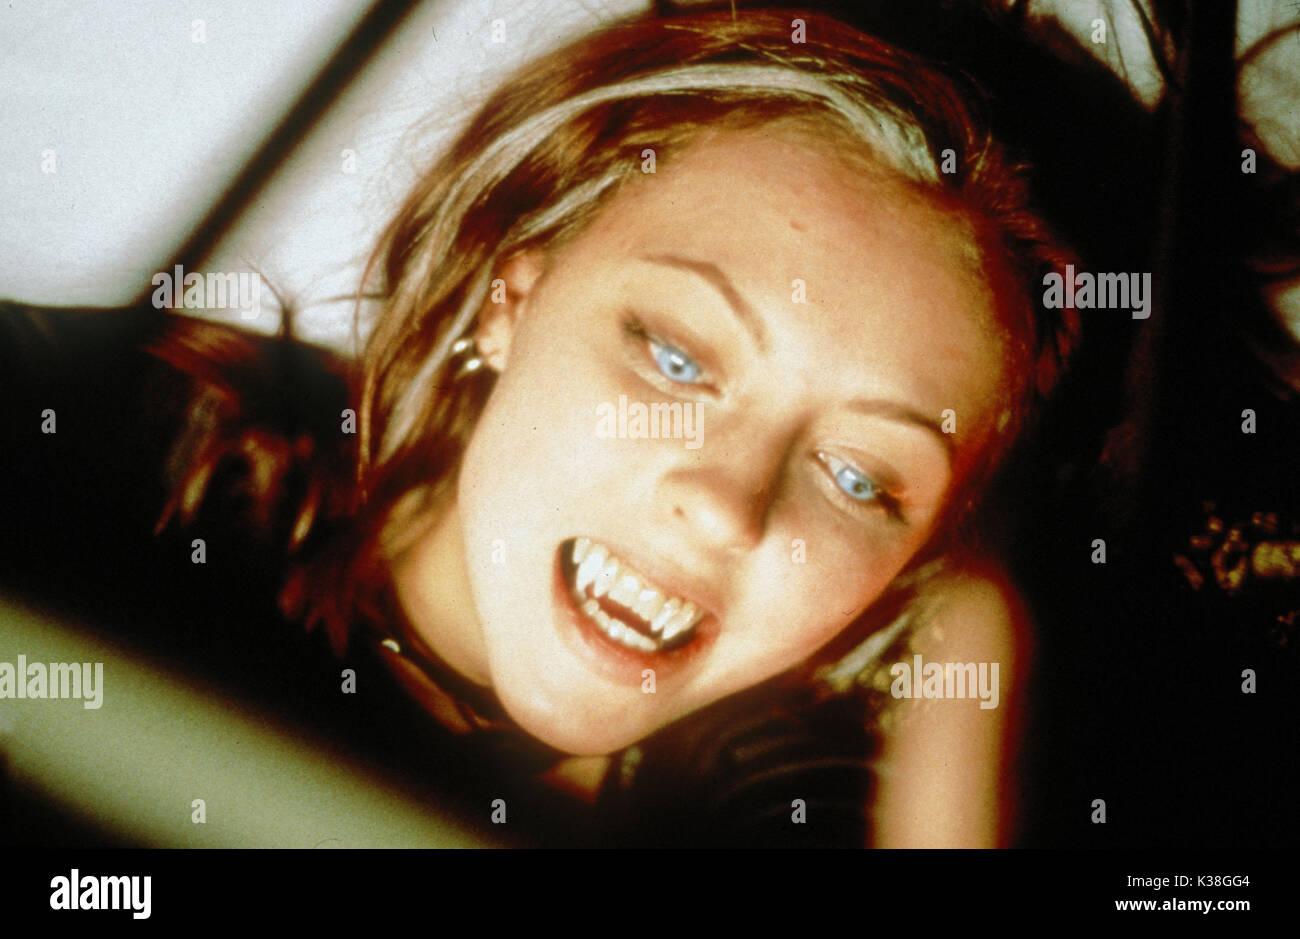 Edward Akrout (born 1982),Brittany Lo XXX pic Sydne Rome,Mona Louise Rey (b. 2004)